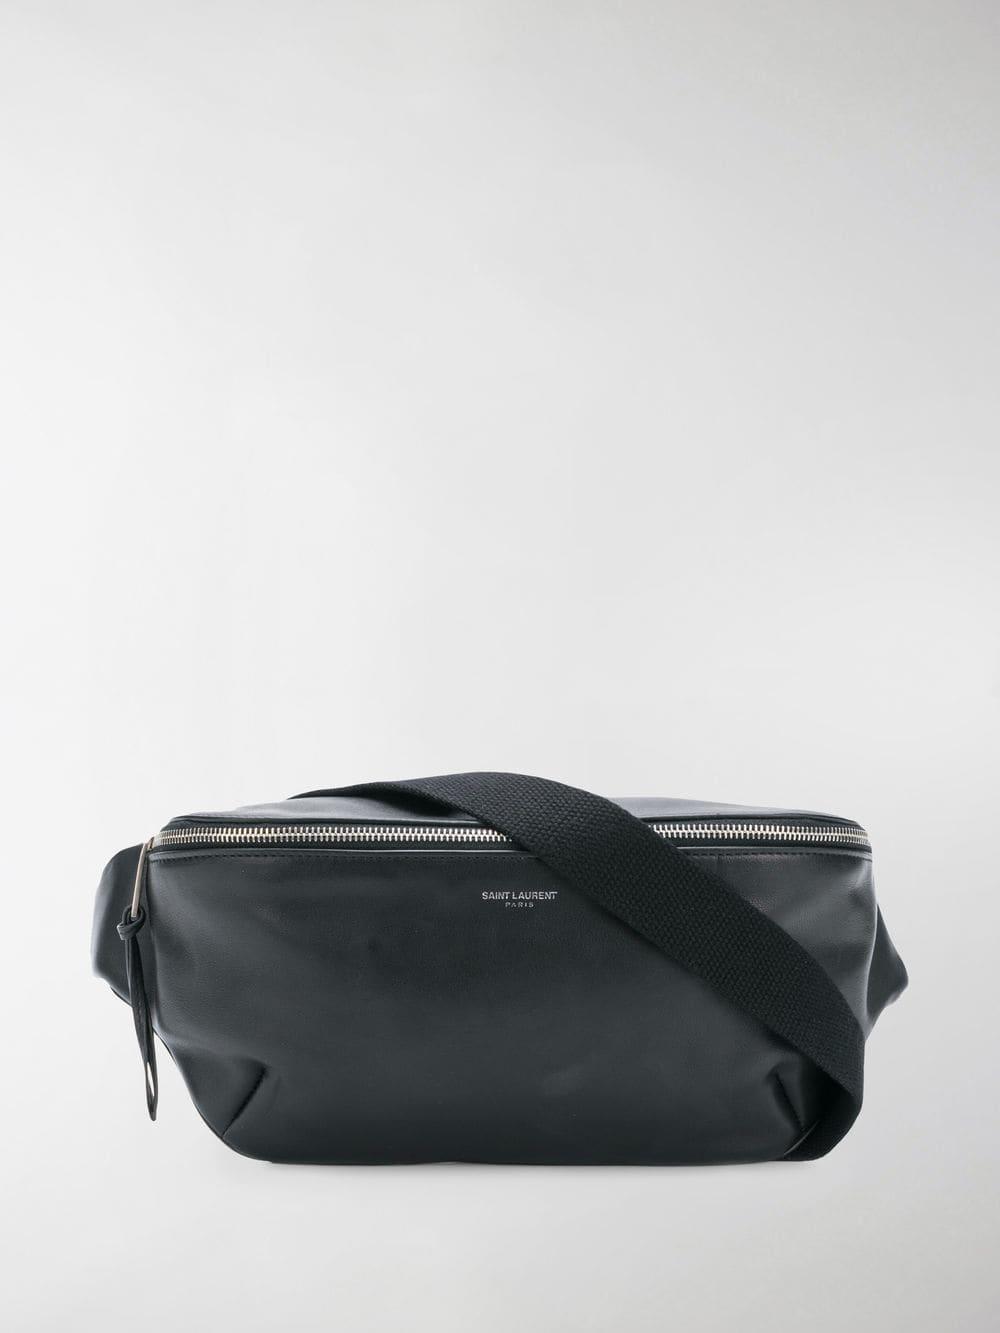 01a7ea8307b19 Saint Laurent Black Logo Leather Crossbody Bag in Black for Men ...